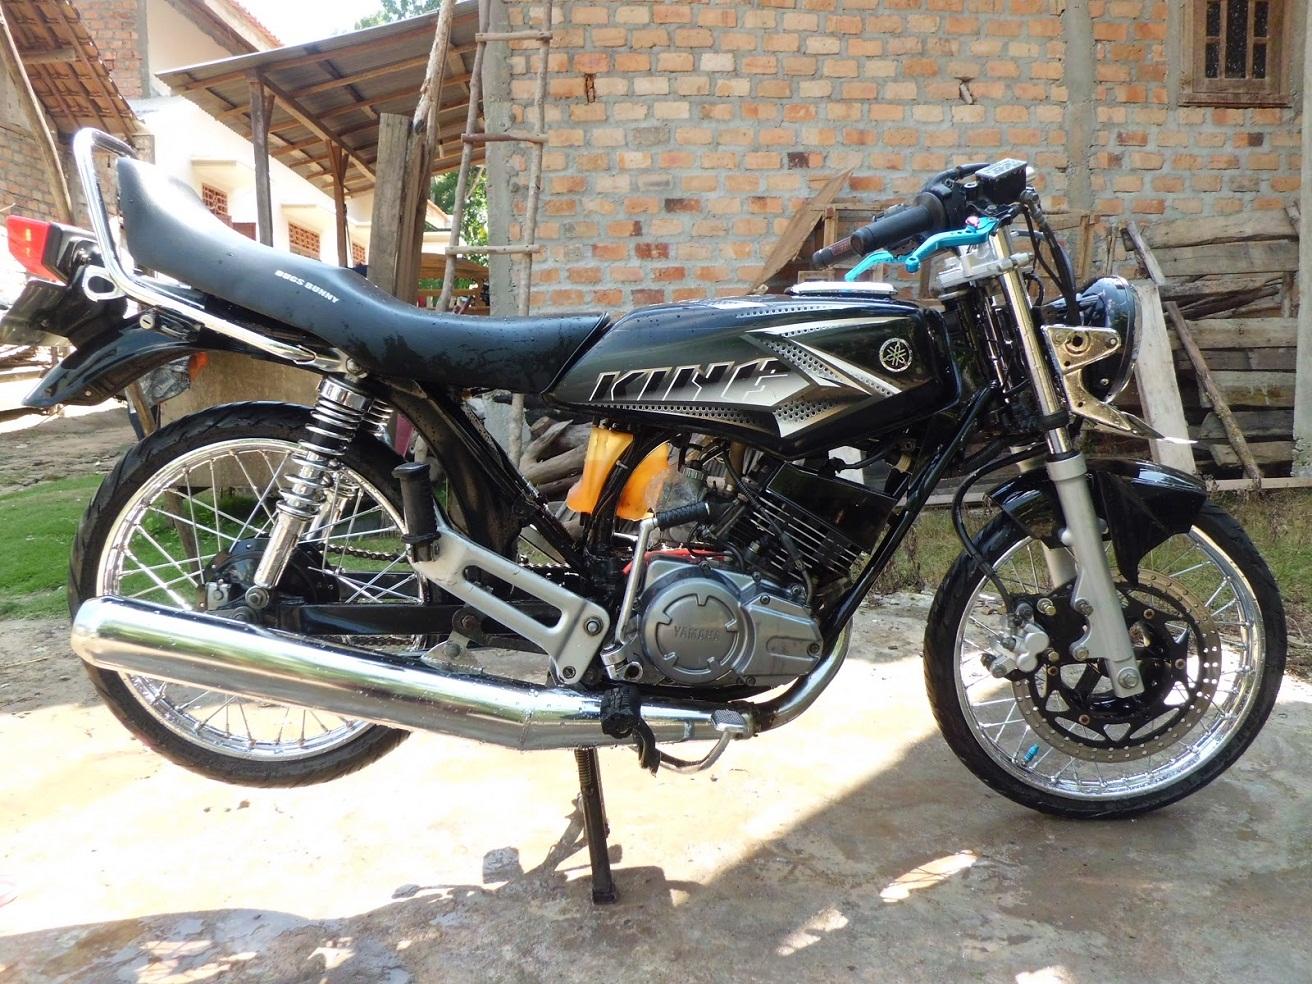 Gambar Modifikasi Rx King Ceper Kumpulan Modifikasi Motor Scoopy